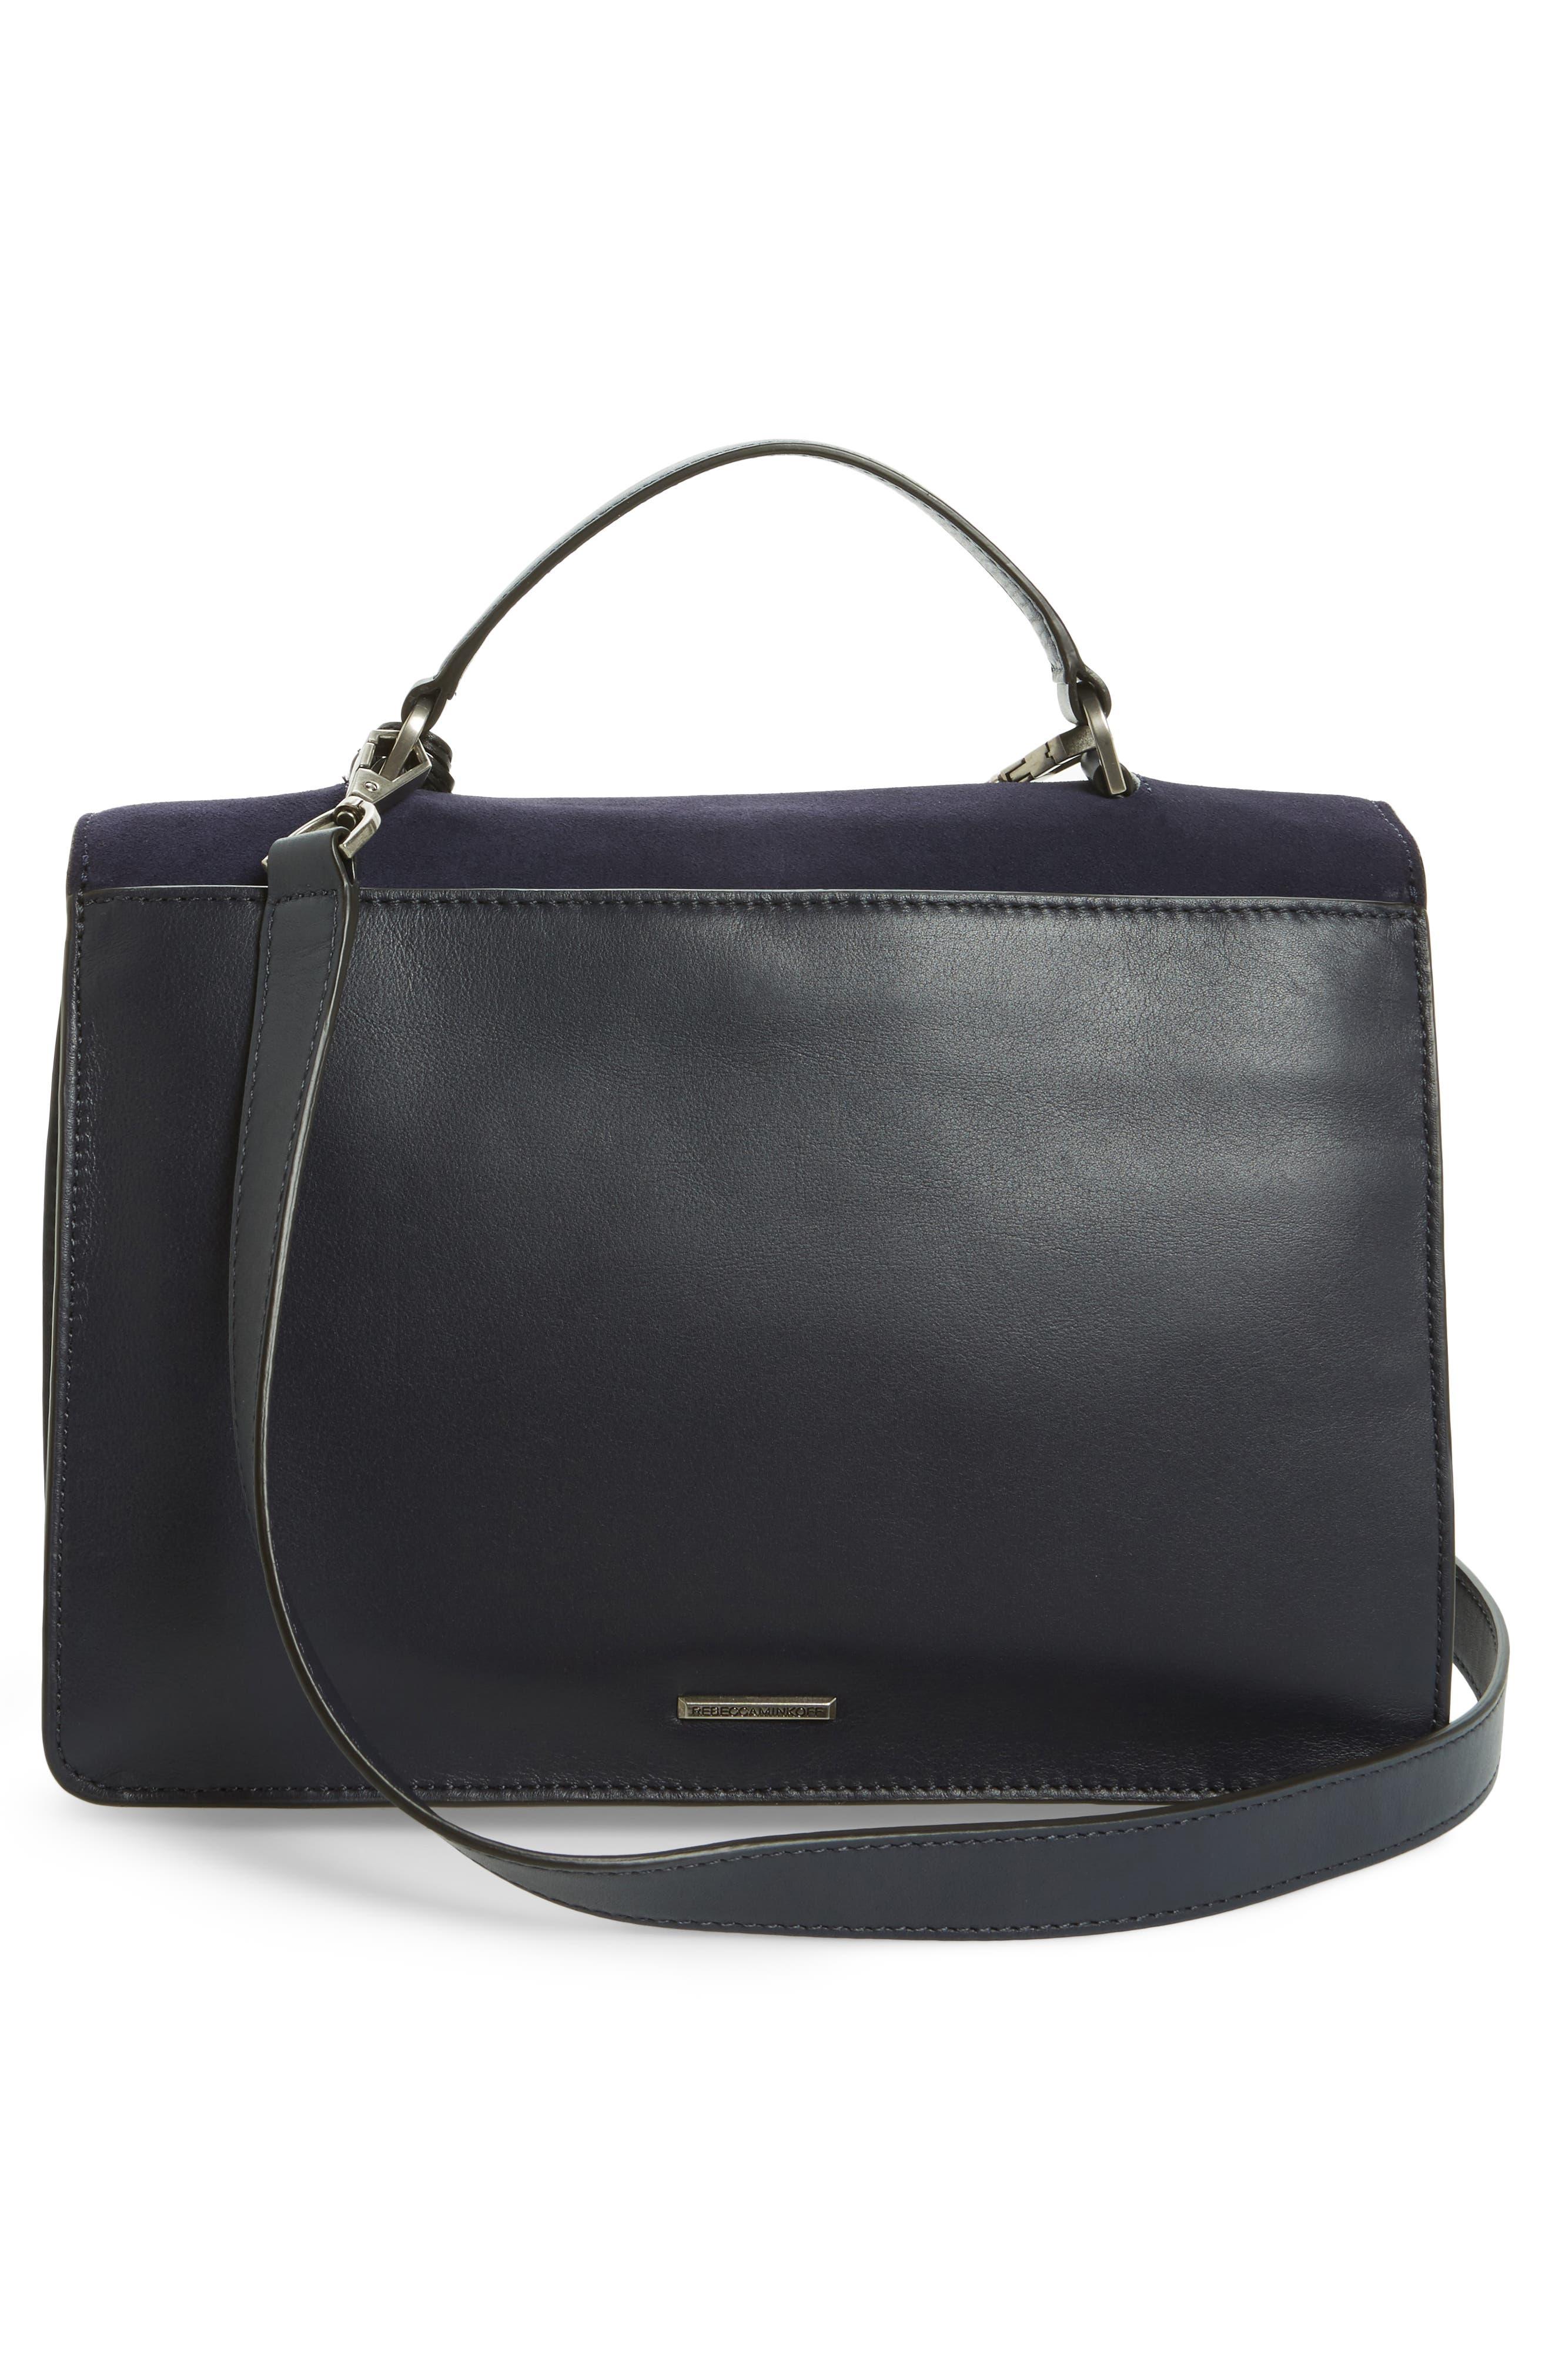 Top Handle Shoulder Bag,                             Alternate thumbnail 3, color,                             001